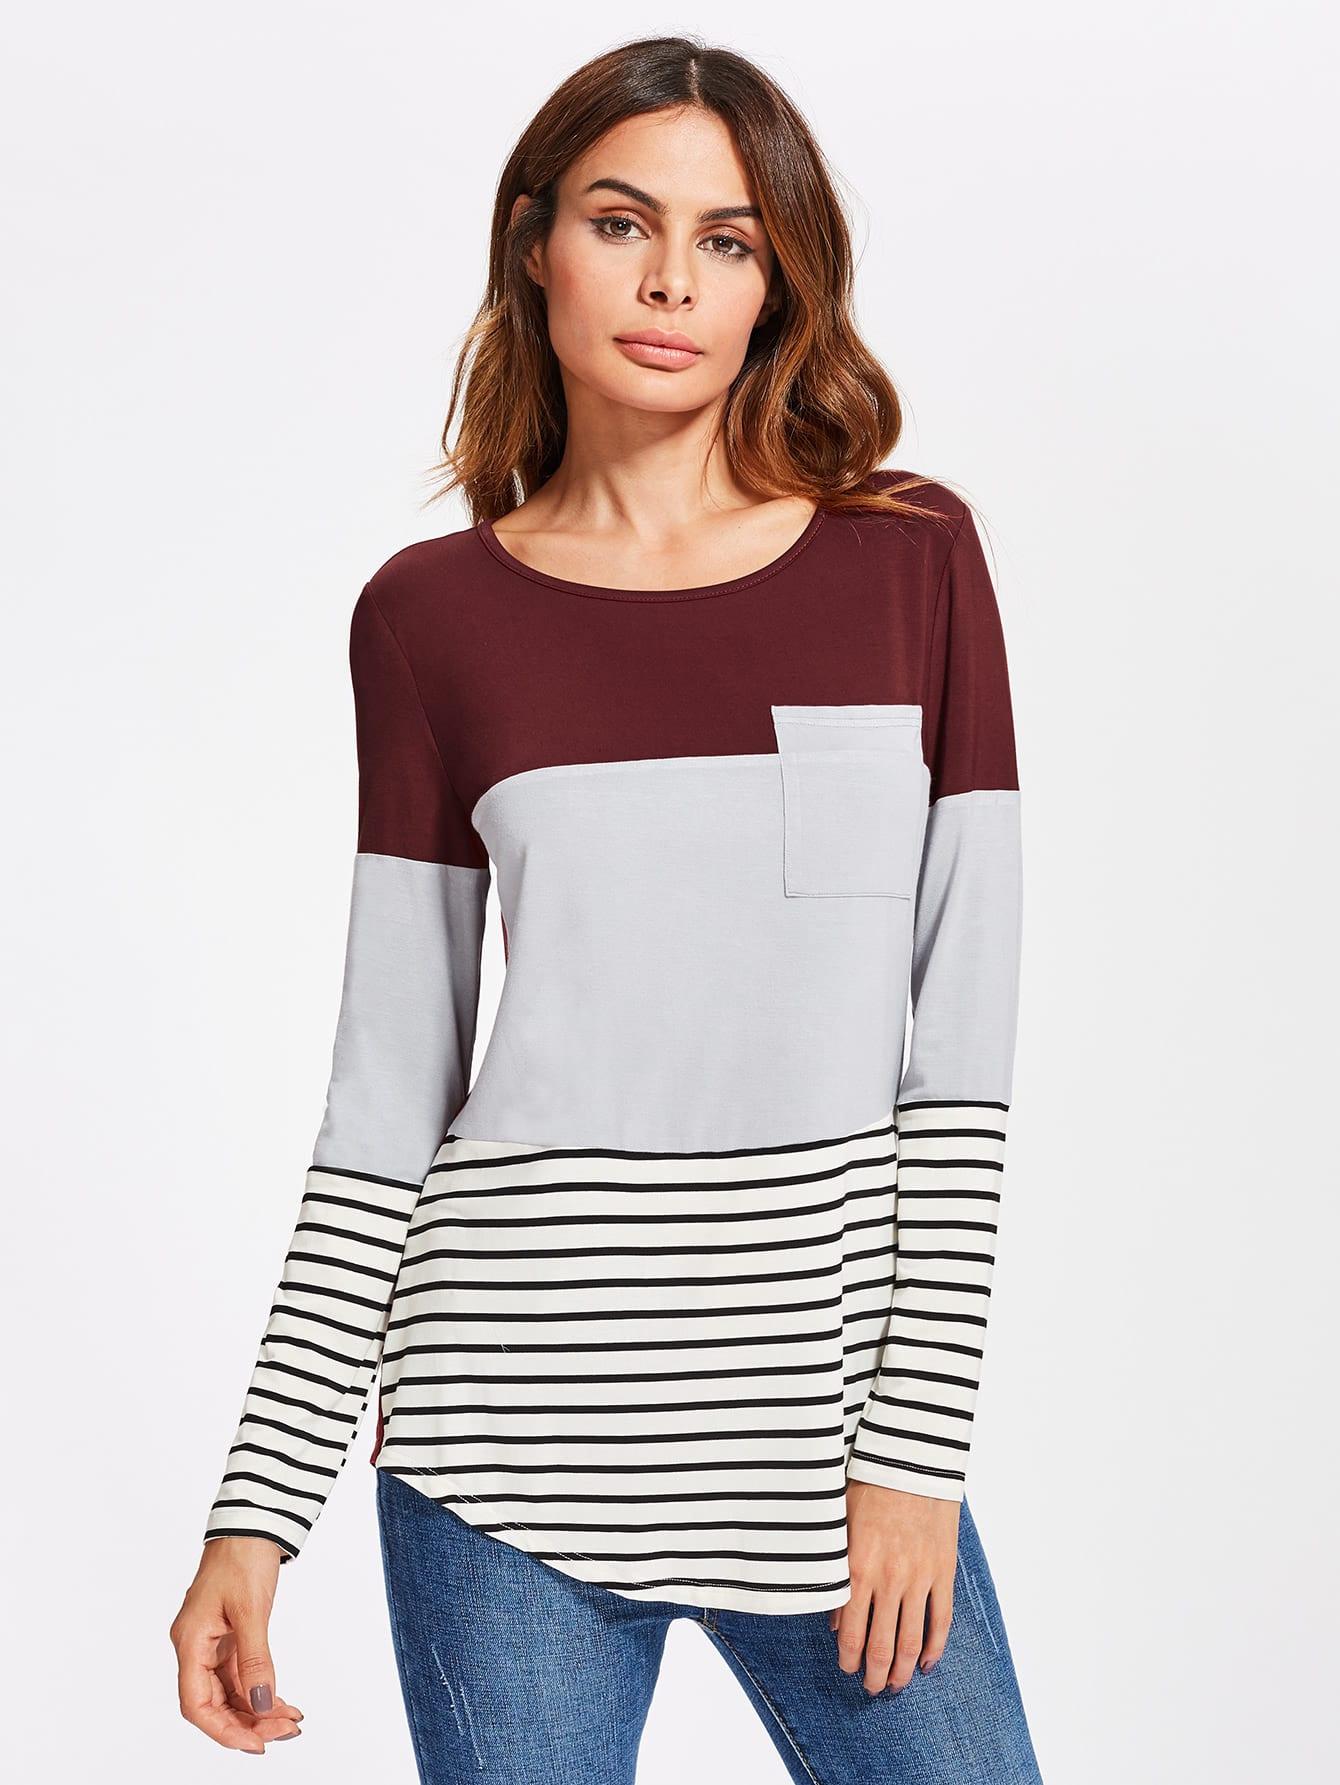 757f5c3302 Pocket Front Cut And Sew Curve Hem Tee EmmaCloth-Women Fast ...